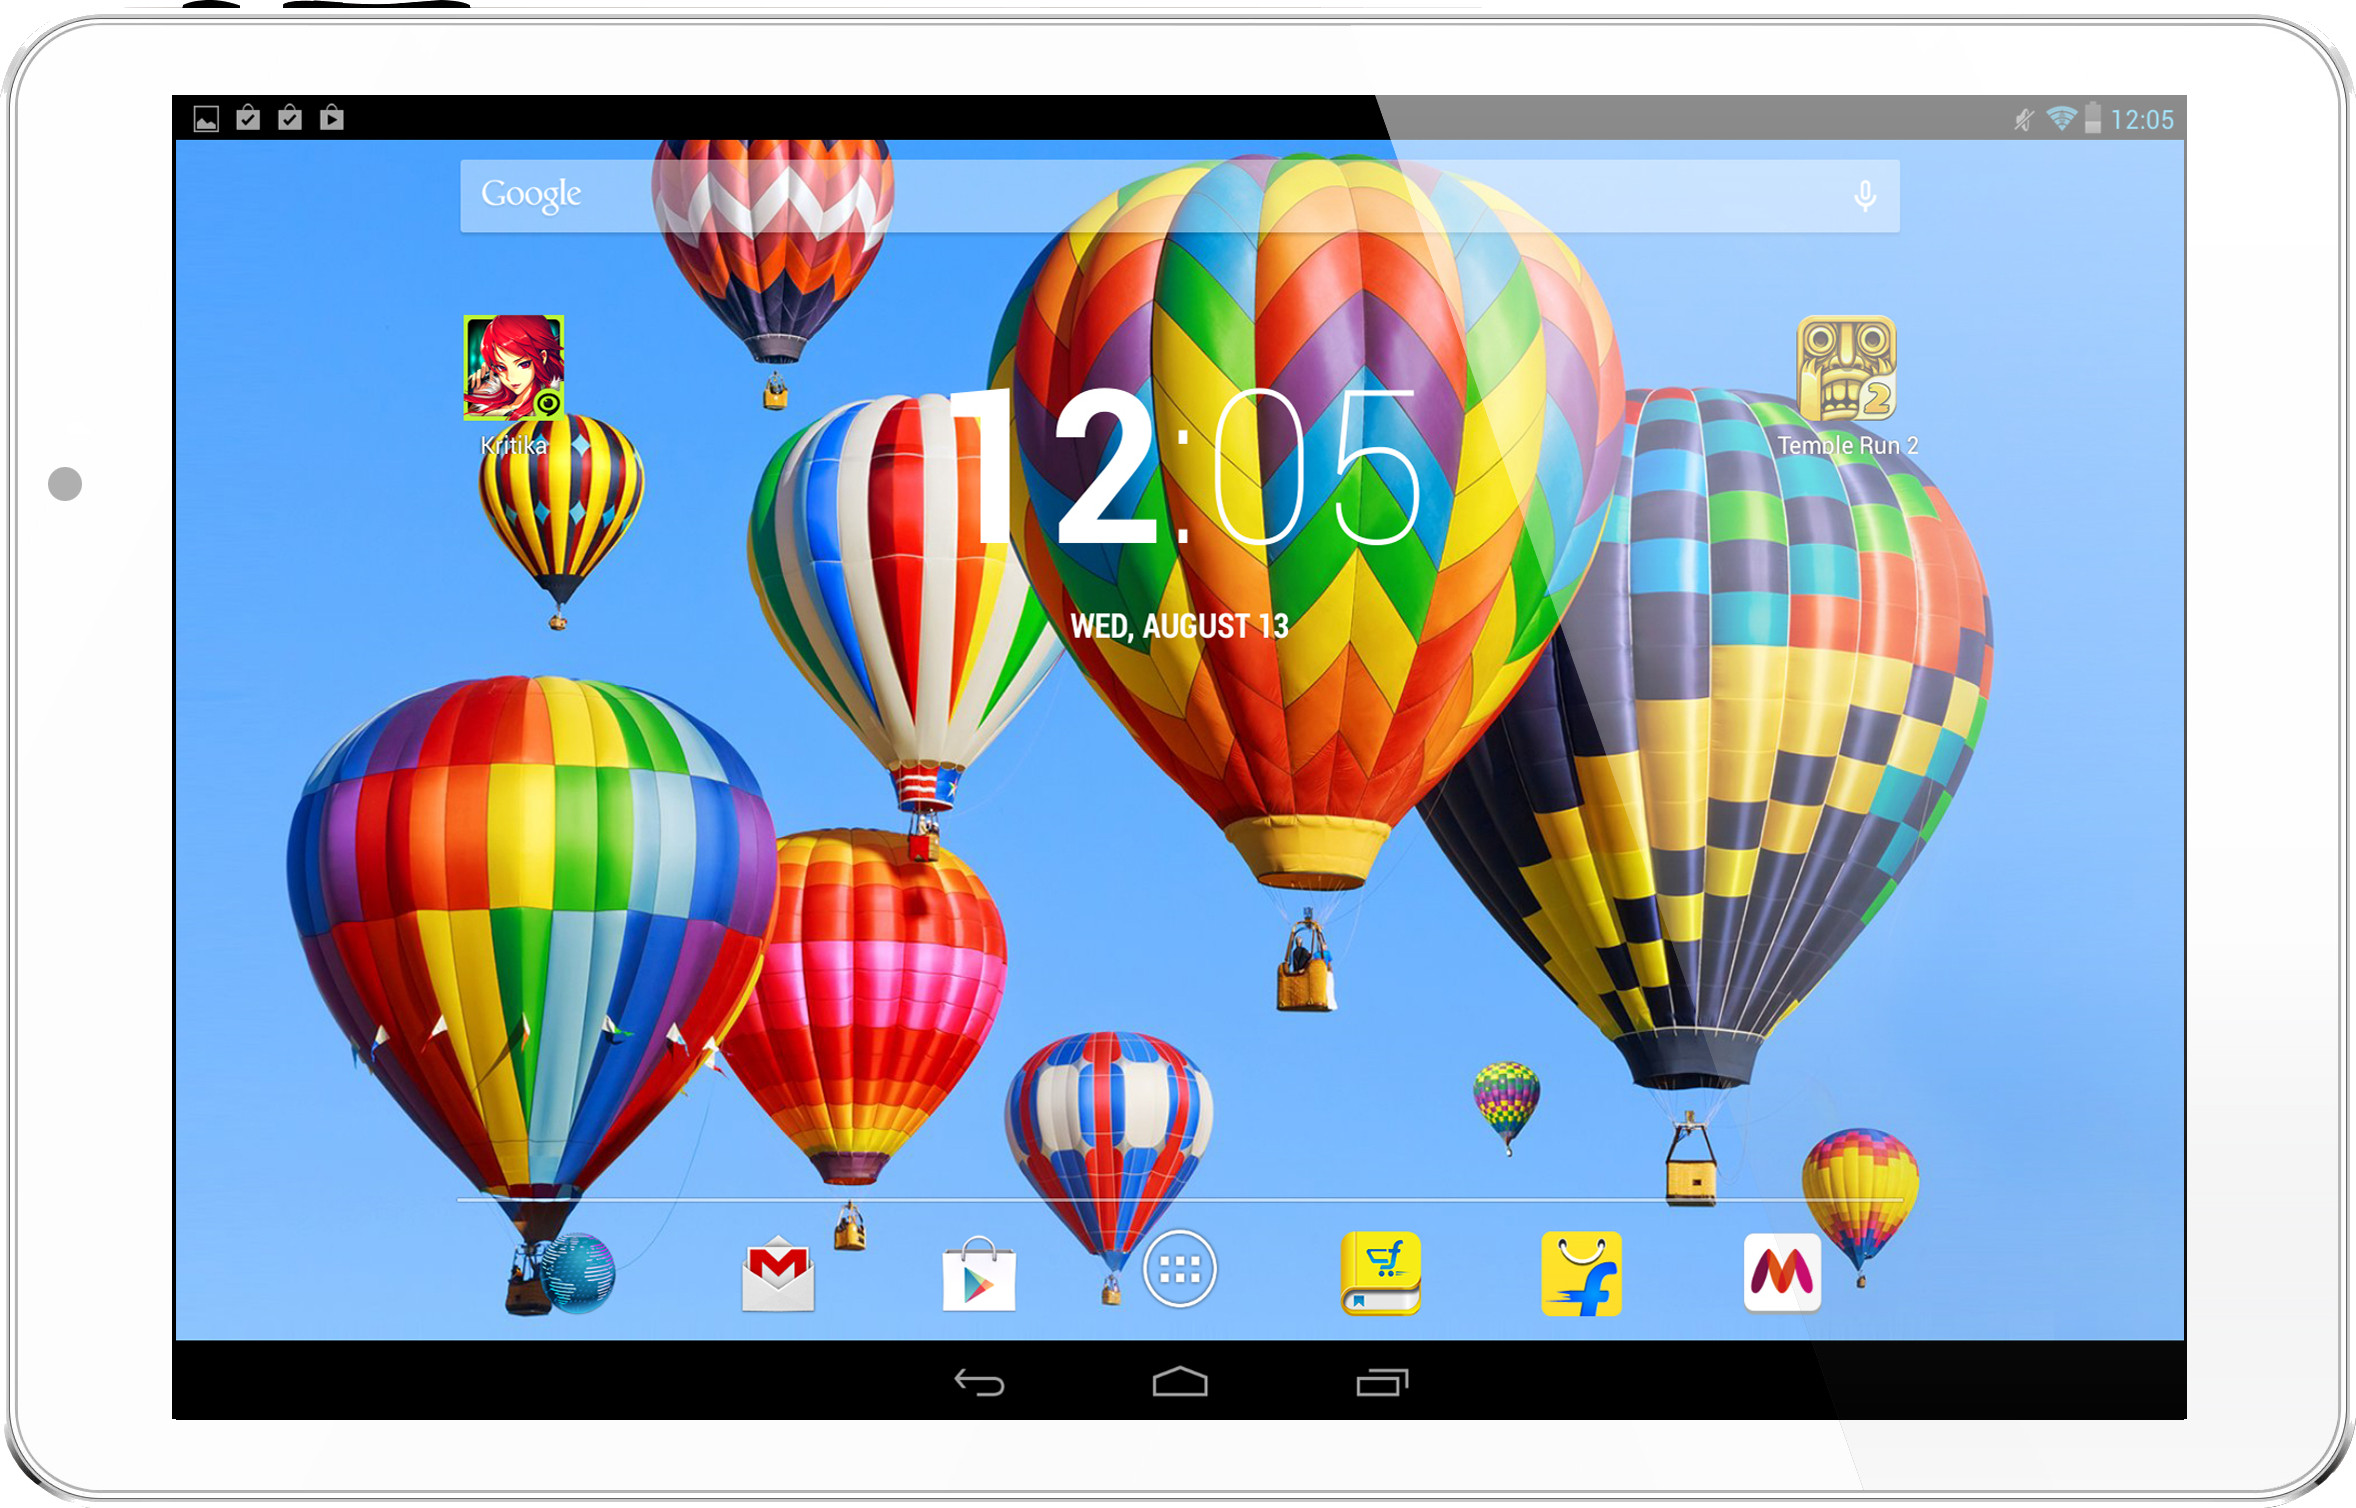 Digiflip Pro XT901 Tablet White, 16 GB, Wi-Fi Only